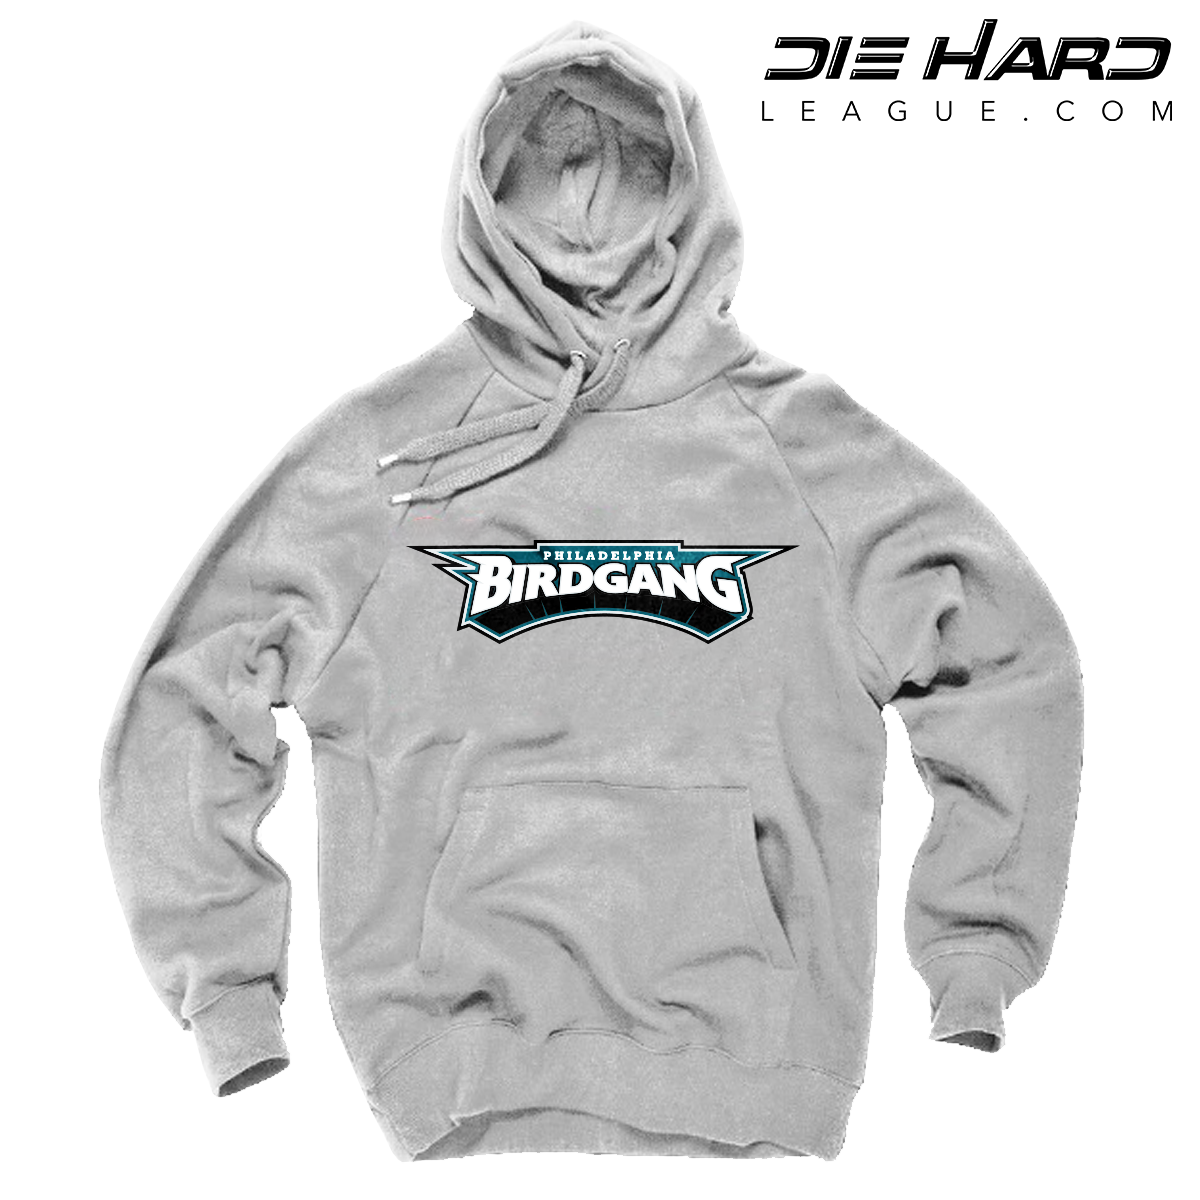 1fdfa0162a2 Philadelphia Eagles Hoodie - Bird Gang White Hoodie